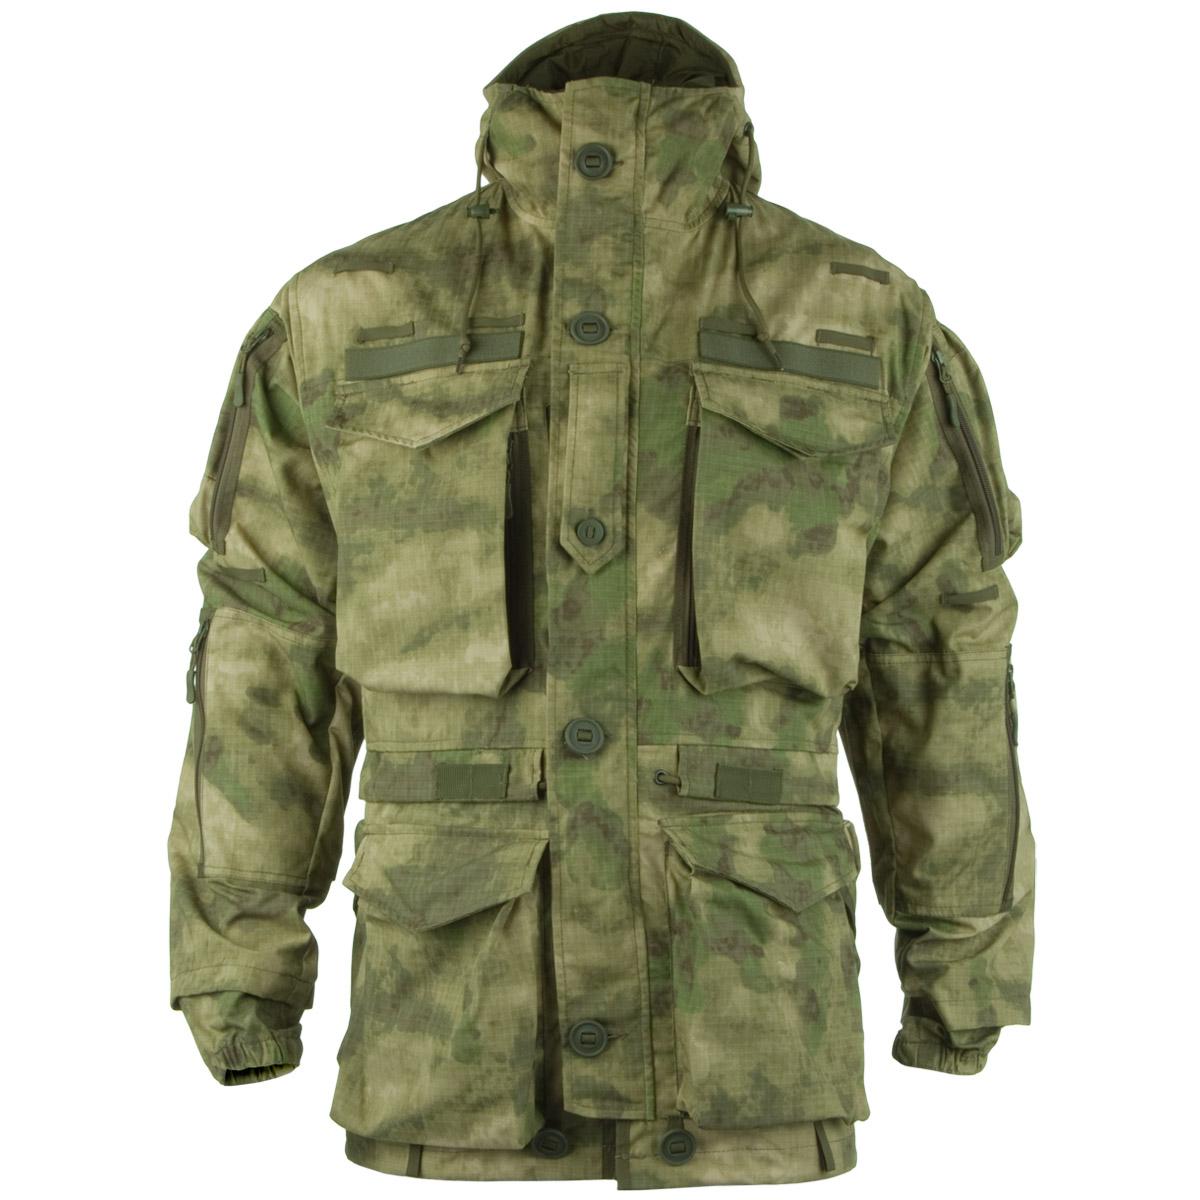 Teesar Smock Generation Ii Mil Tacs Fg Parka Military 1st